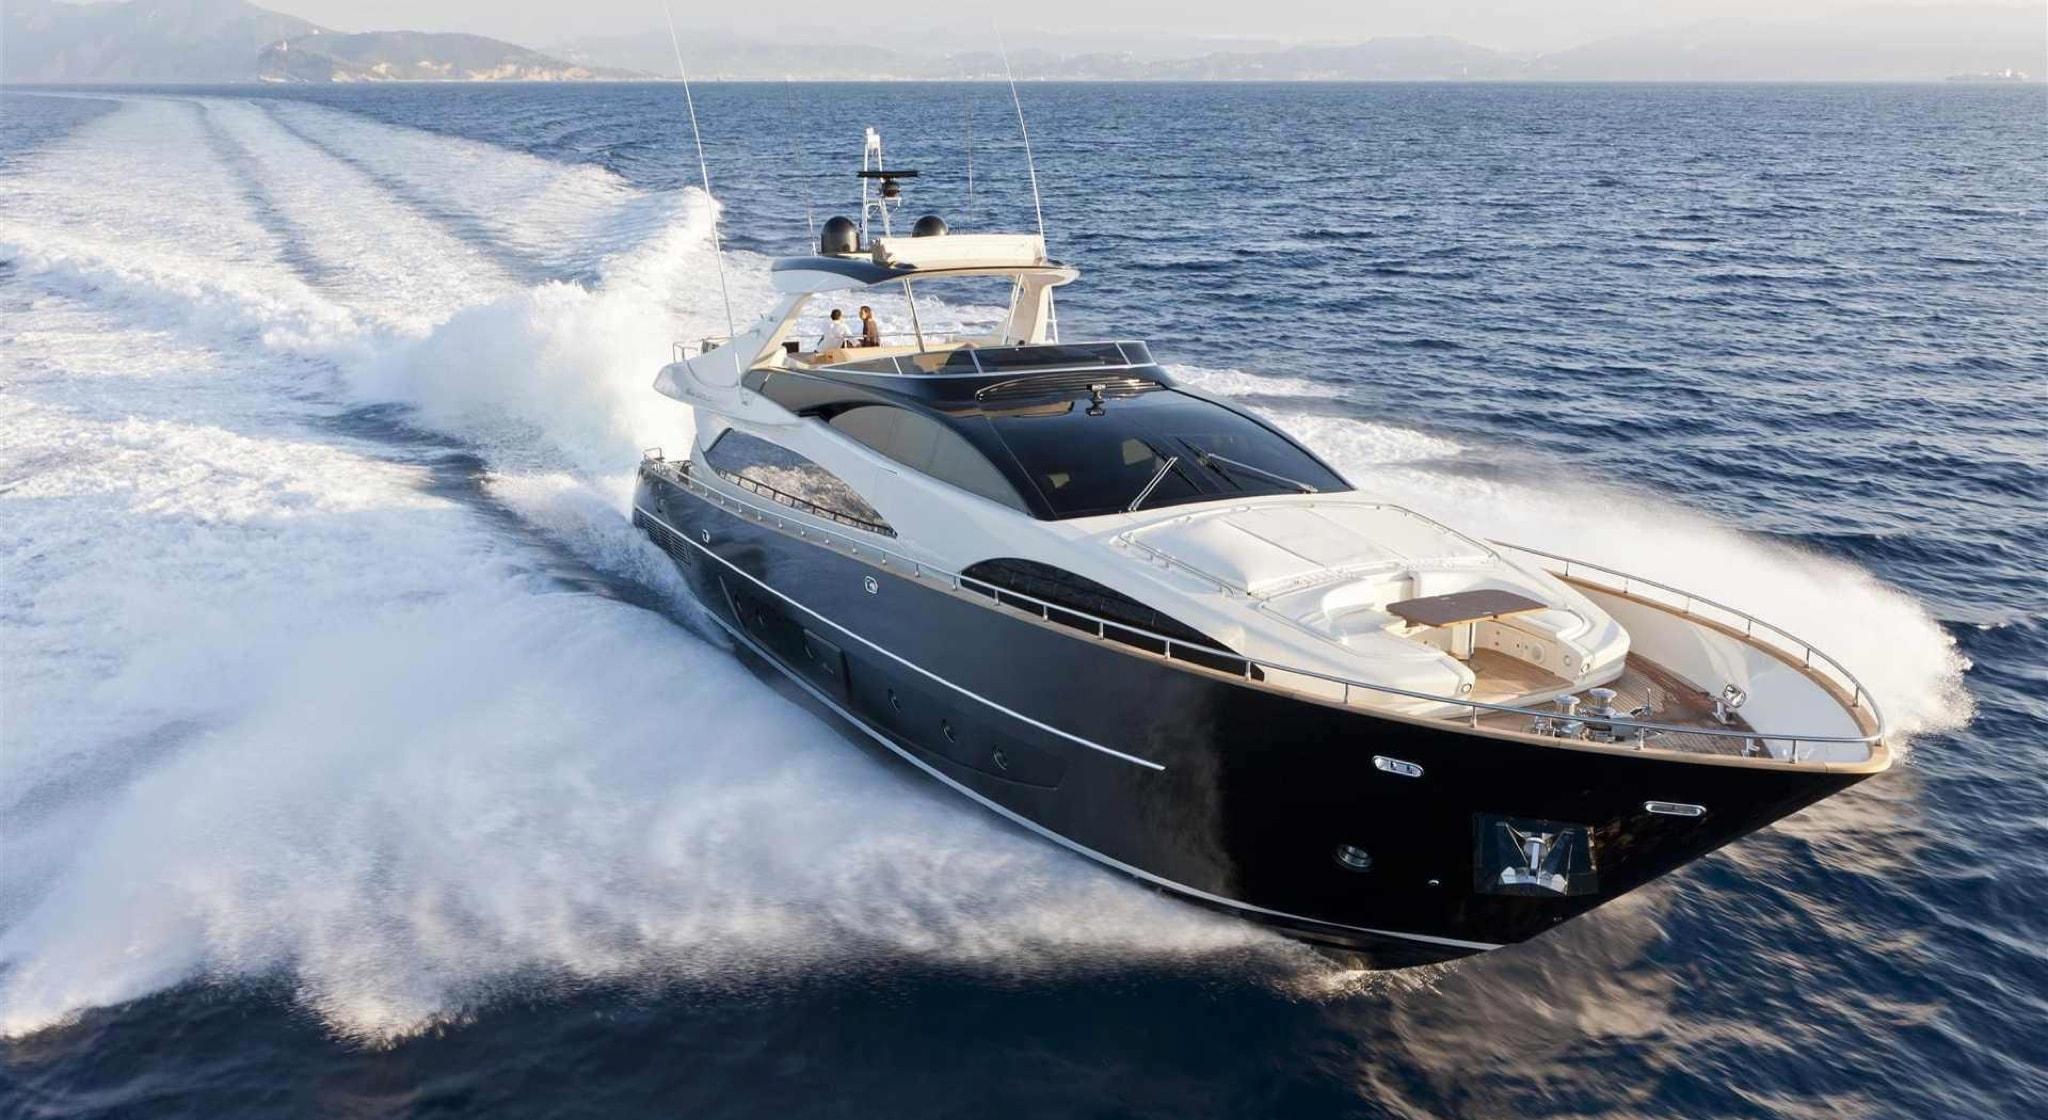 Foto barco para motores marinos